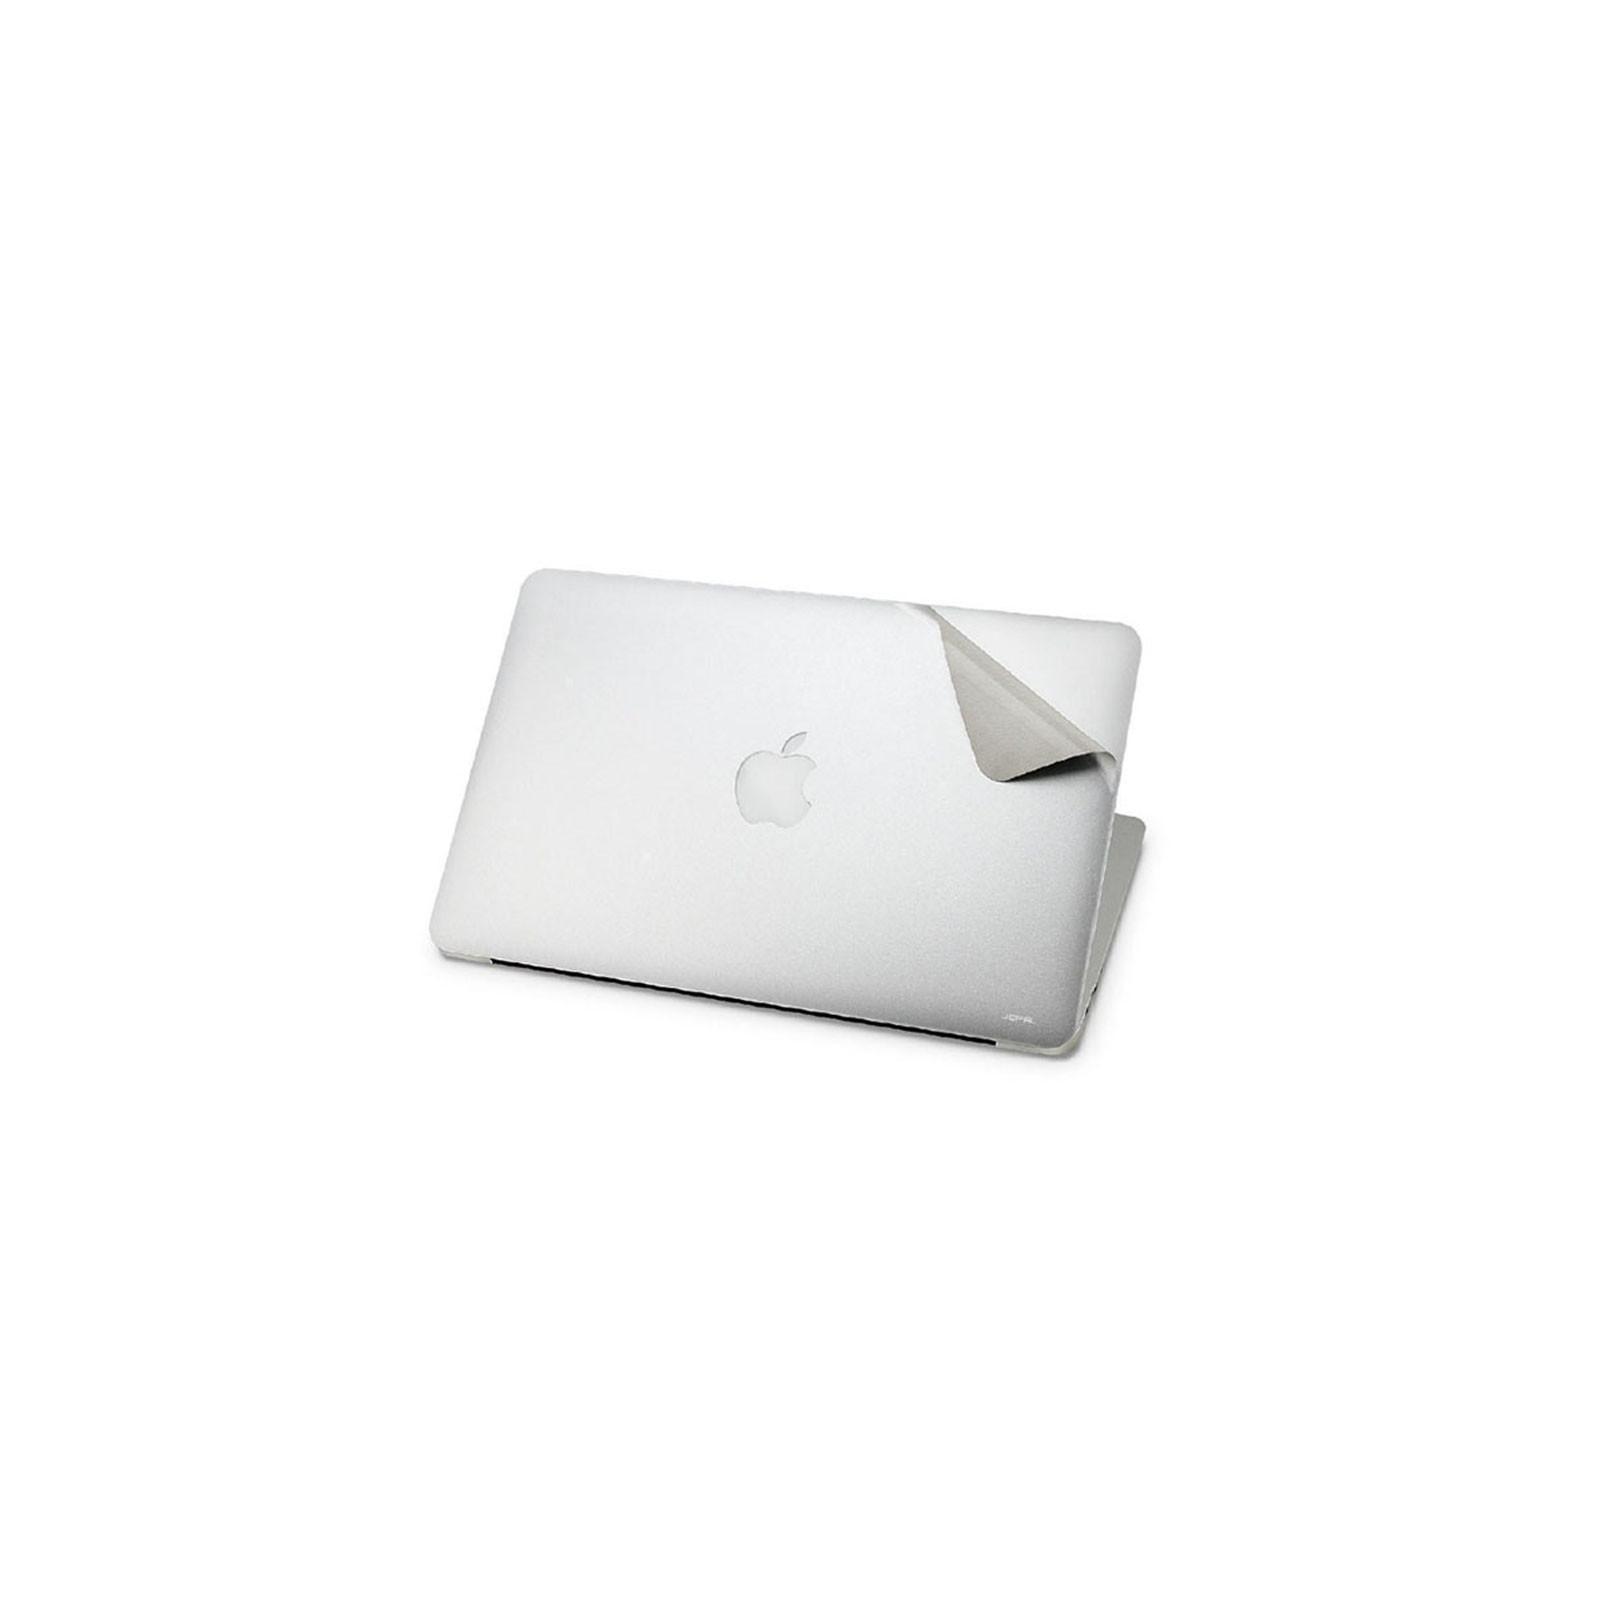 Пленка защитная JCPAL 3 in 1 set для MacBook Air 13 (JCP2044) изображение 3